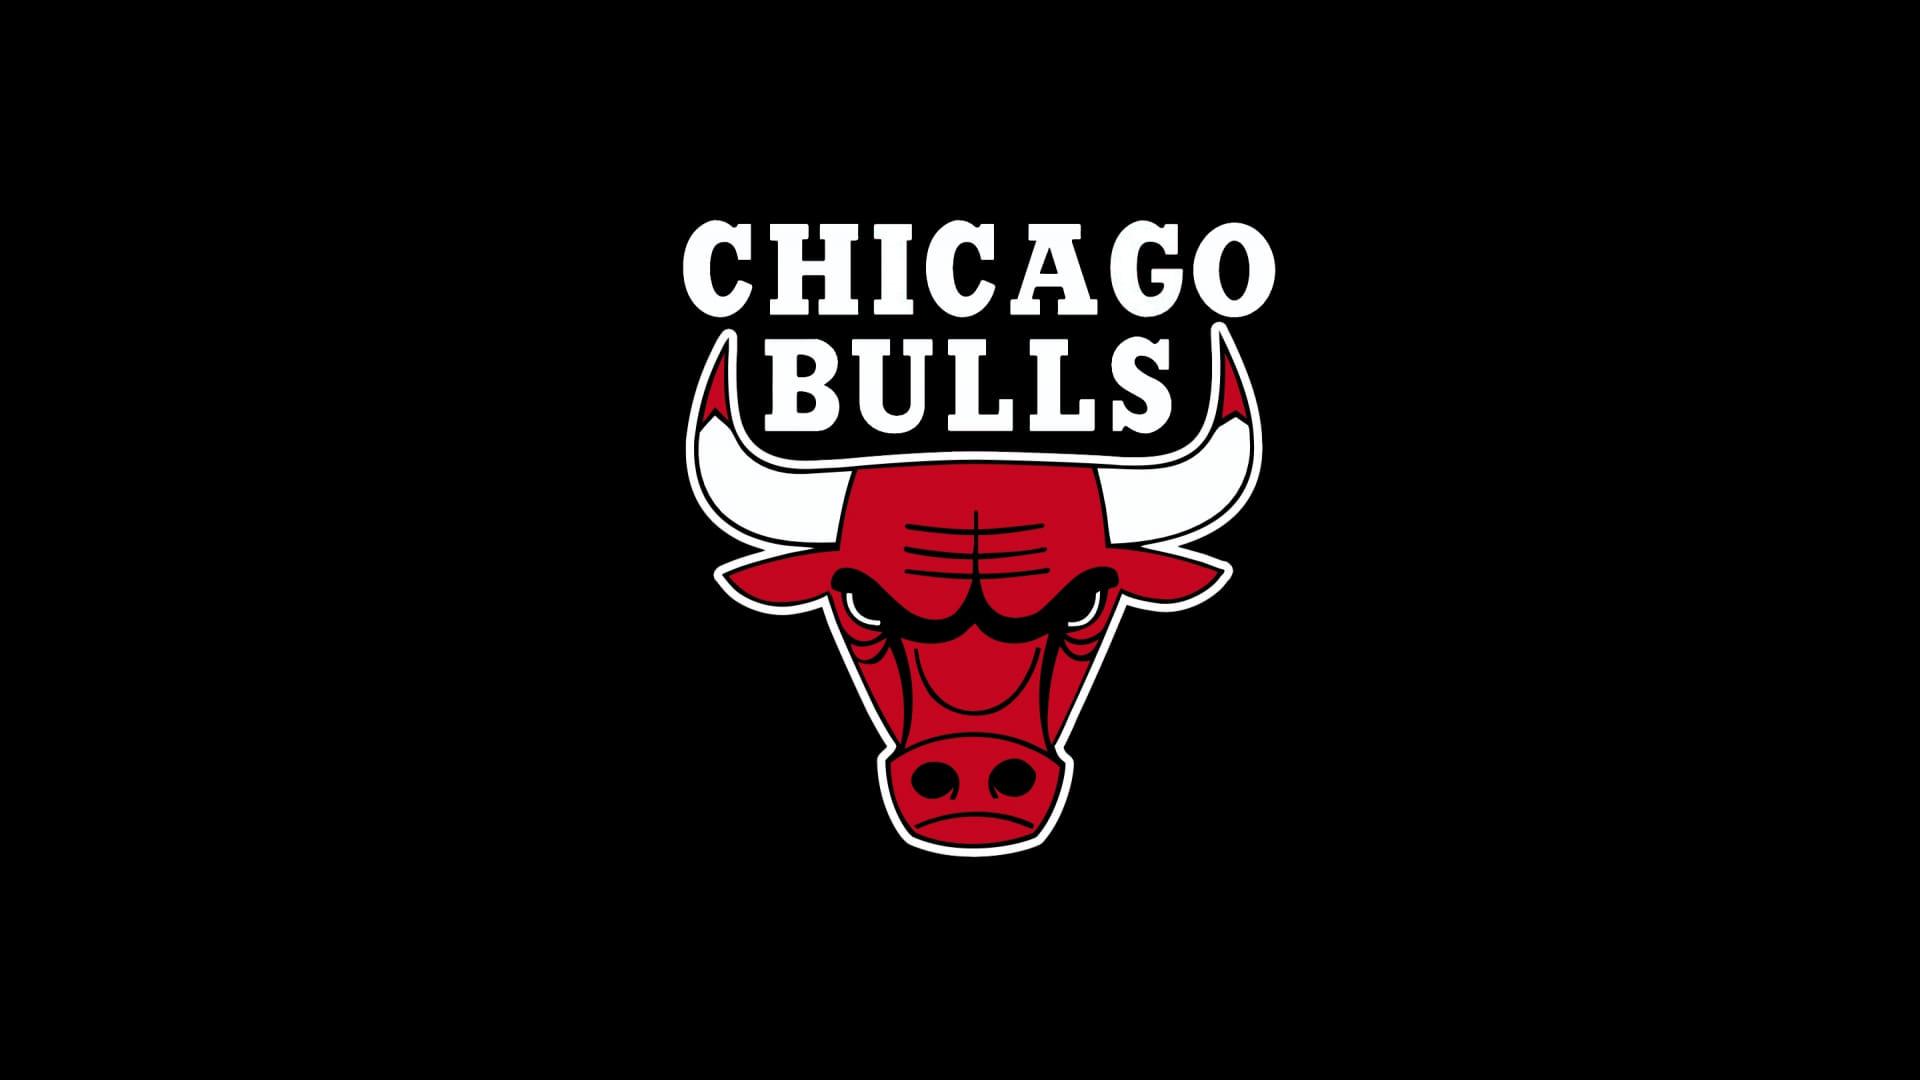 Modnyj rejting klubnyh emblem NBA 26. Chicago Bulls